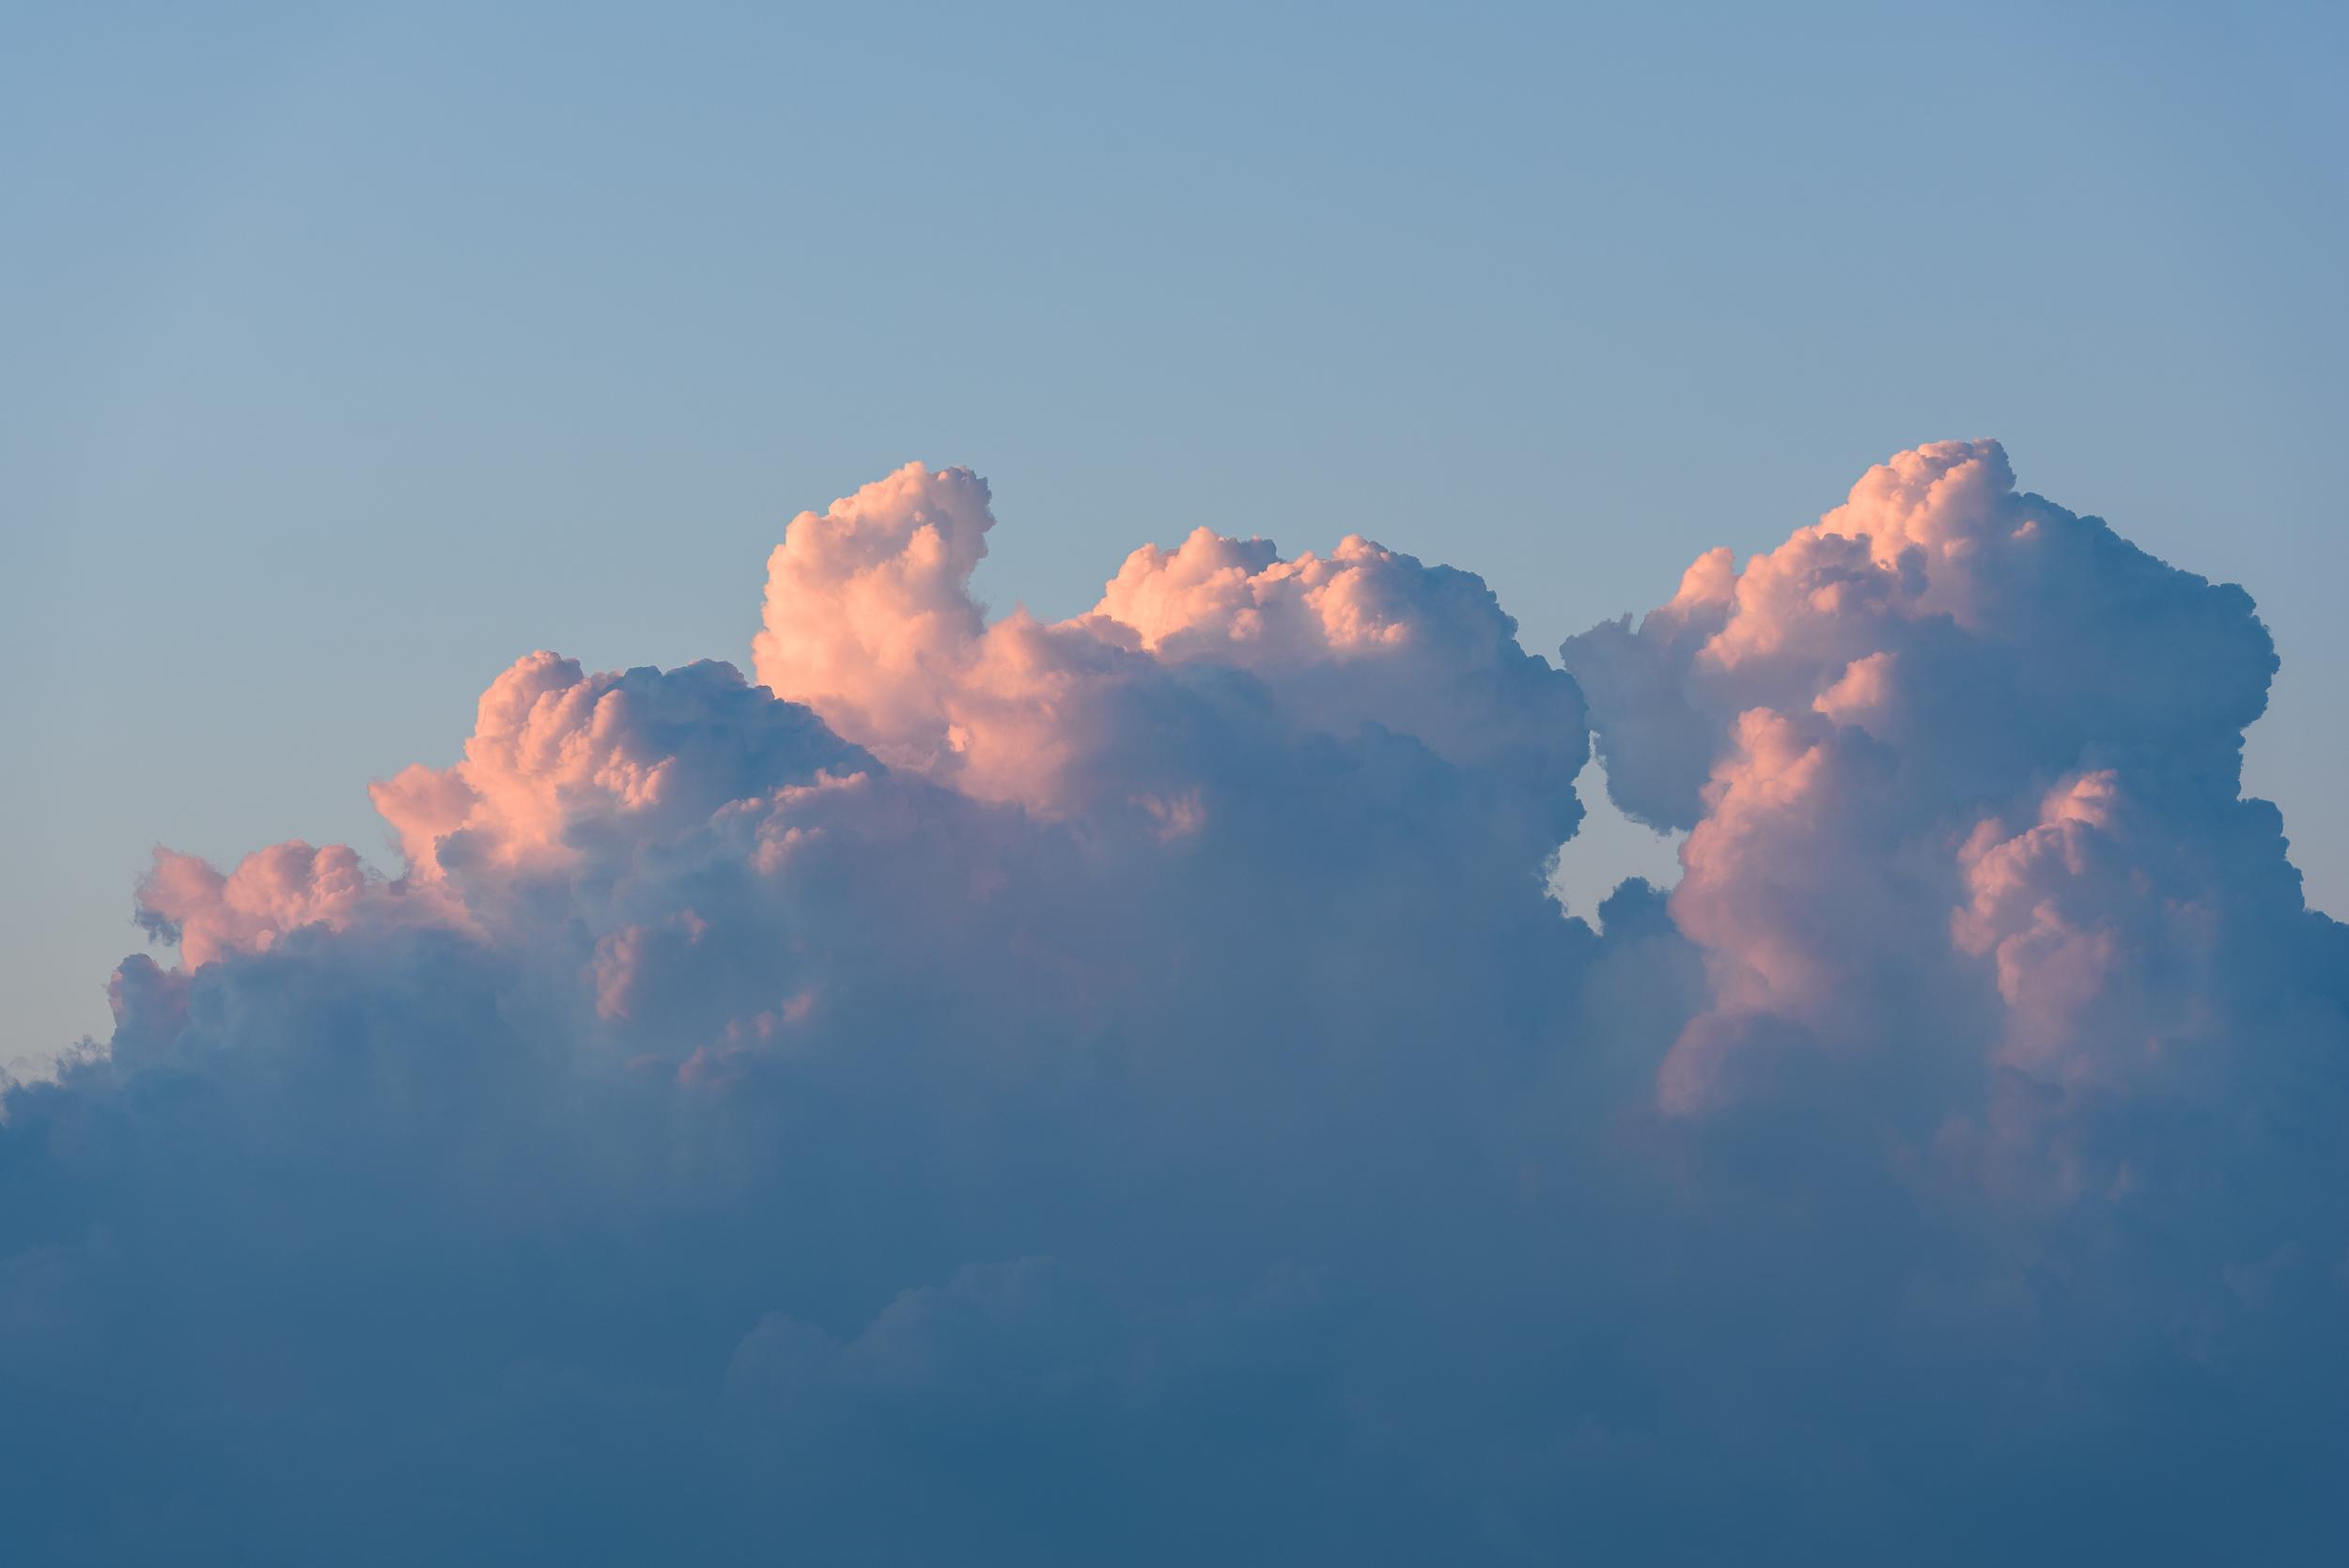 2018-08-11_Web_4891_Sunlight hitting the clouds_.jpg